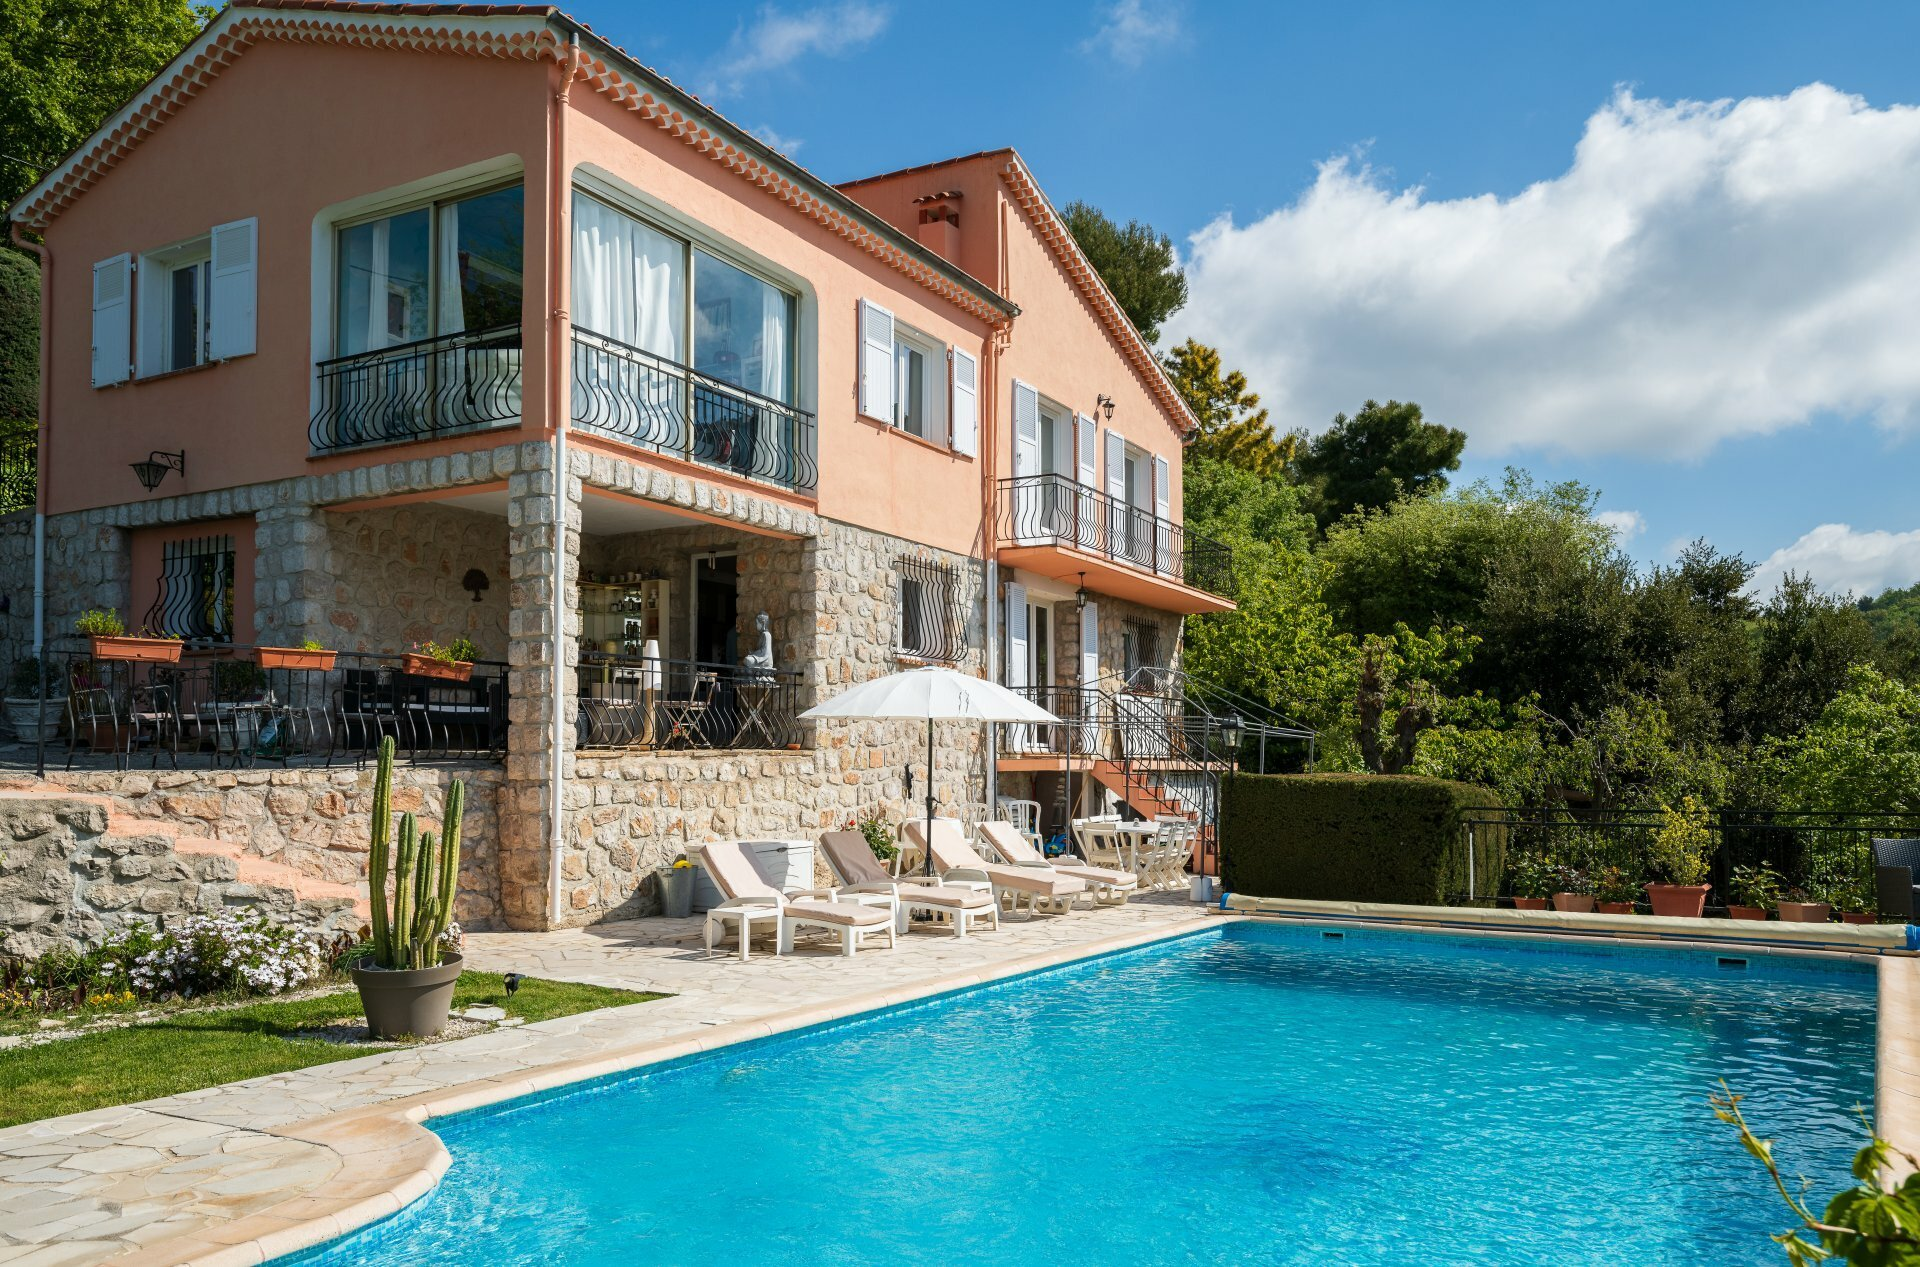 Casa a Tourrette-Levens, Provenza-Alpi-Costa Azzurra, Francia 1 - 11440312